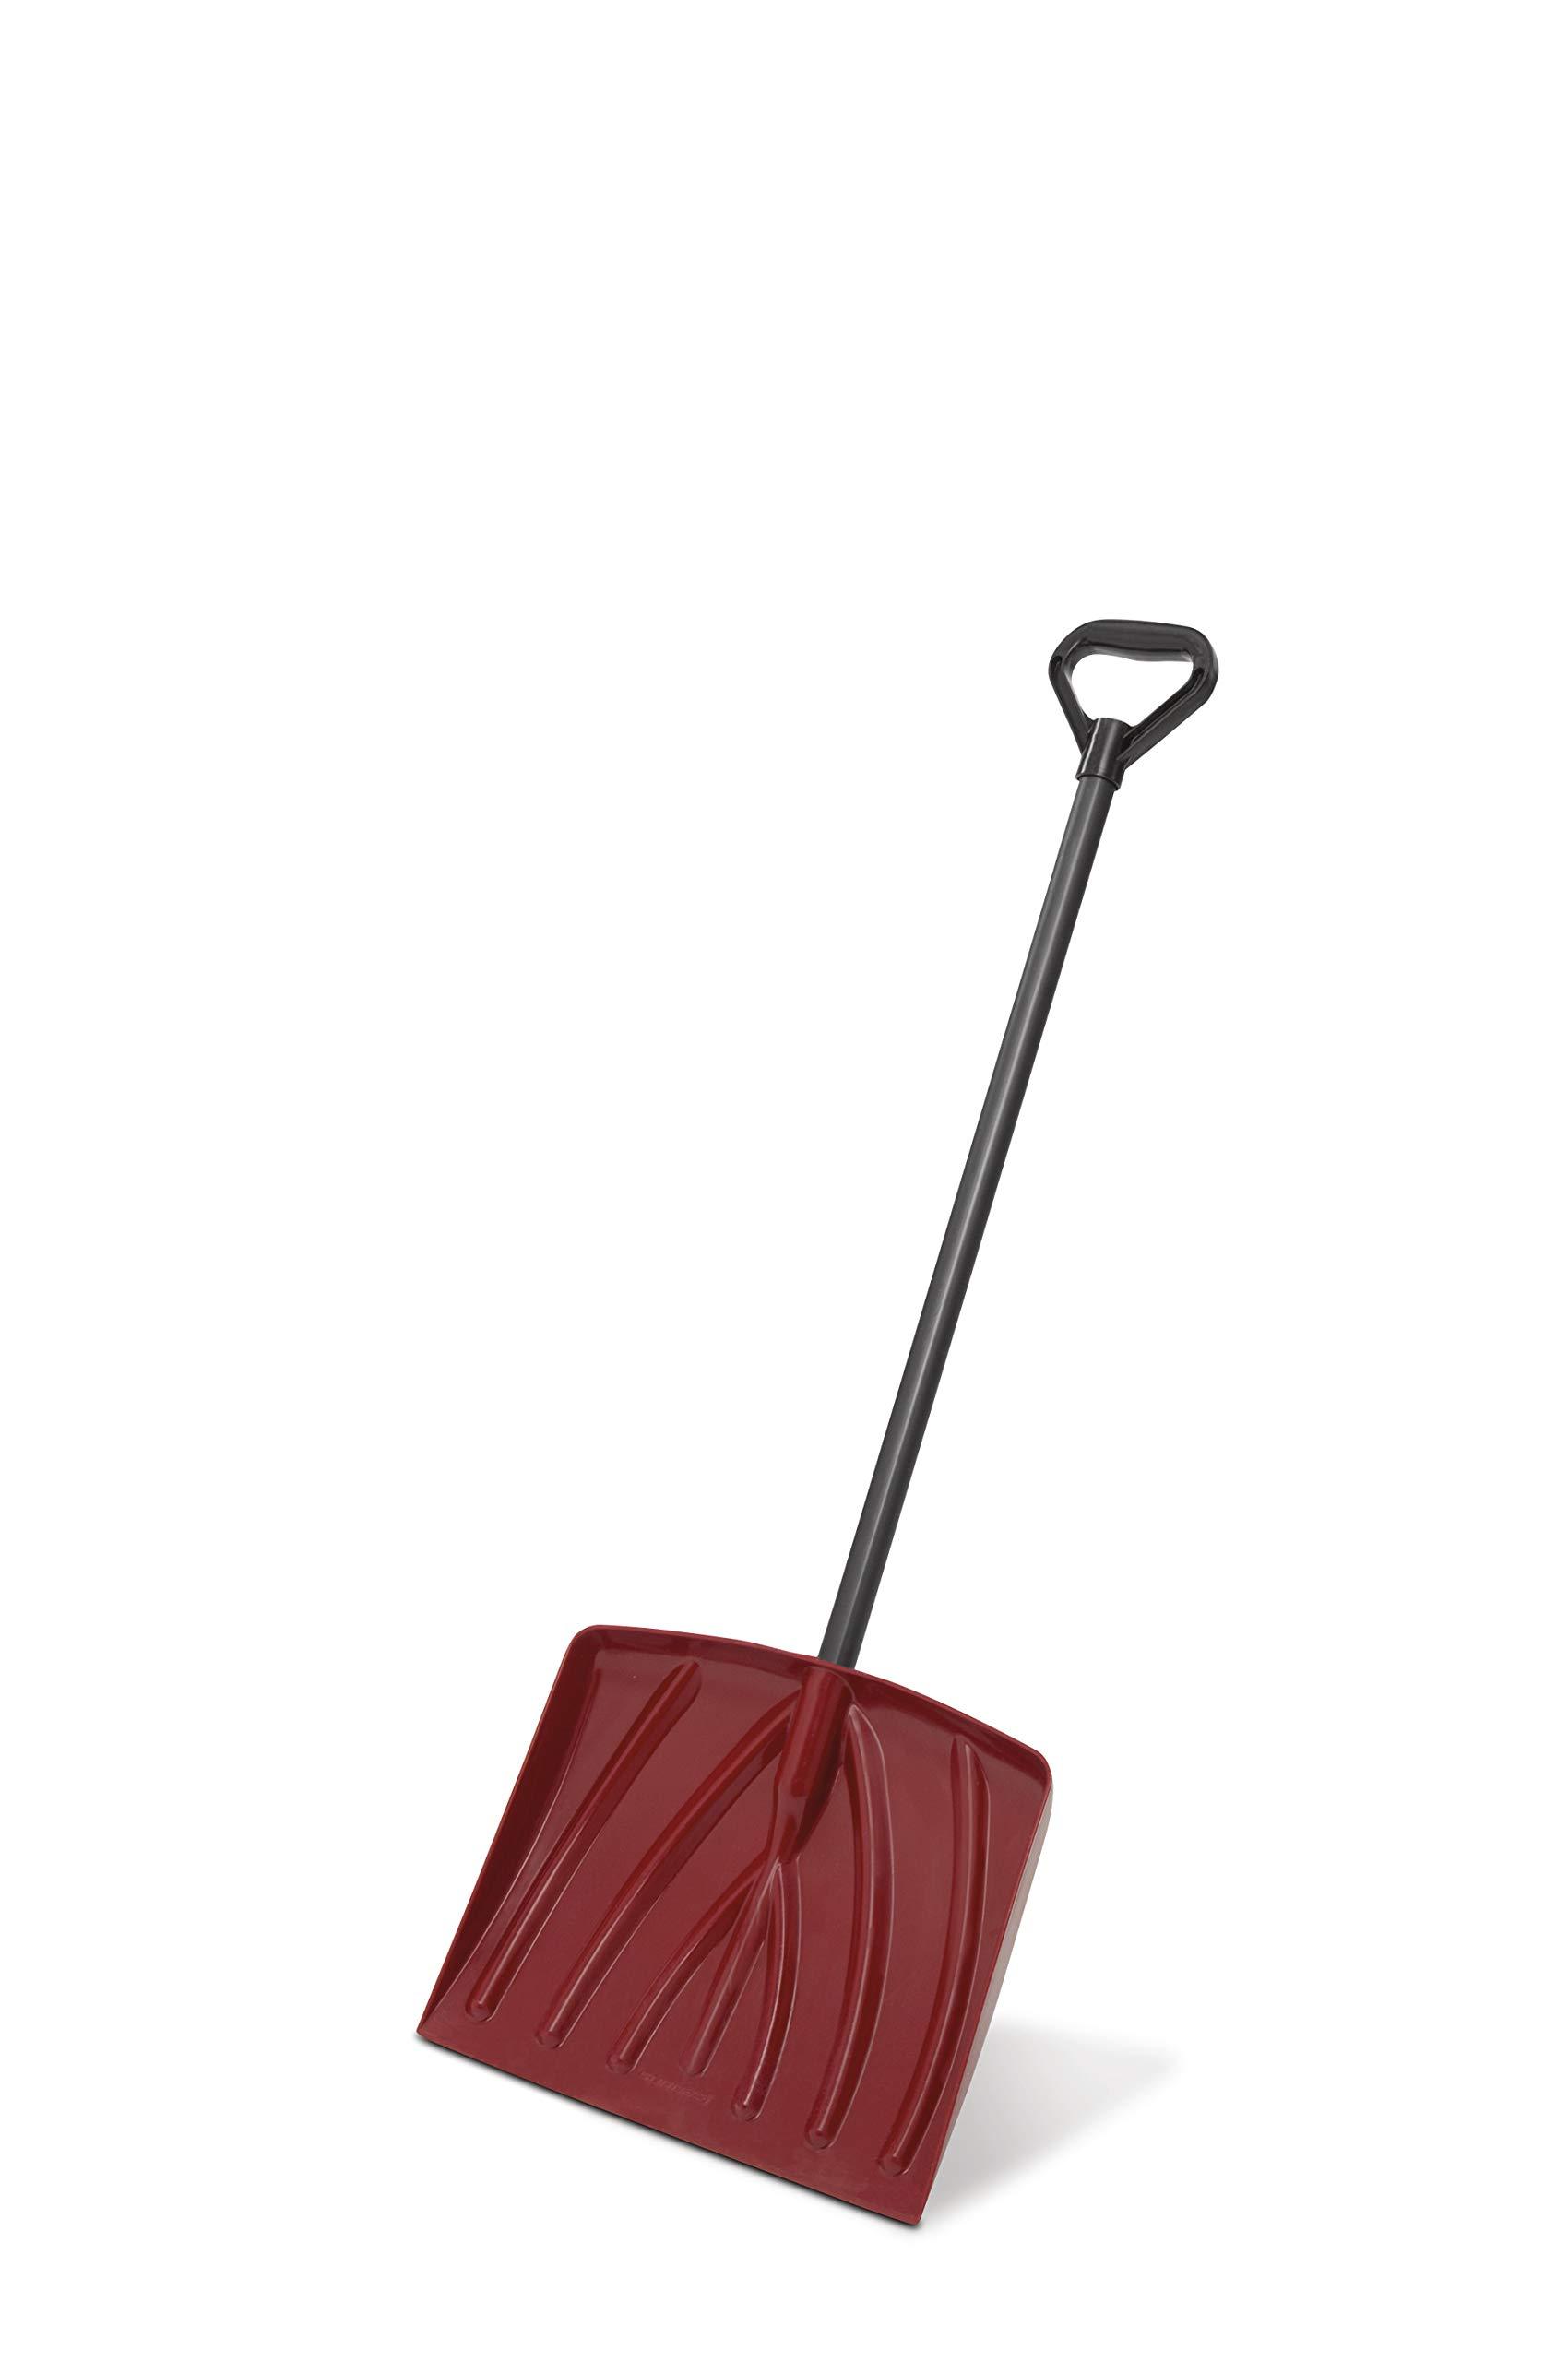 Suncast SK4000 12-Inch Kids Snow Shovel With 34-Inch Resin Handle by Suncast